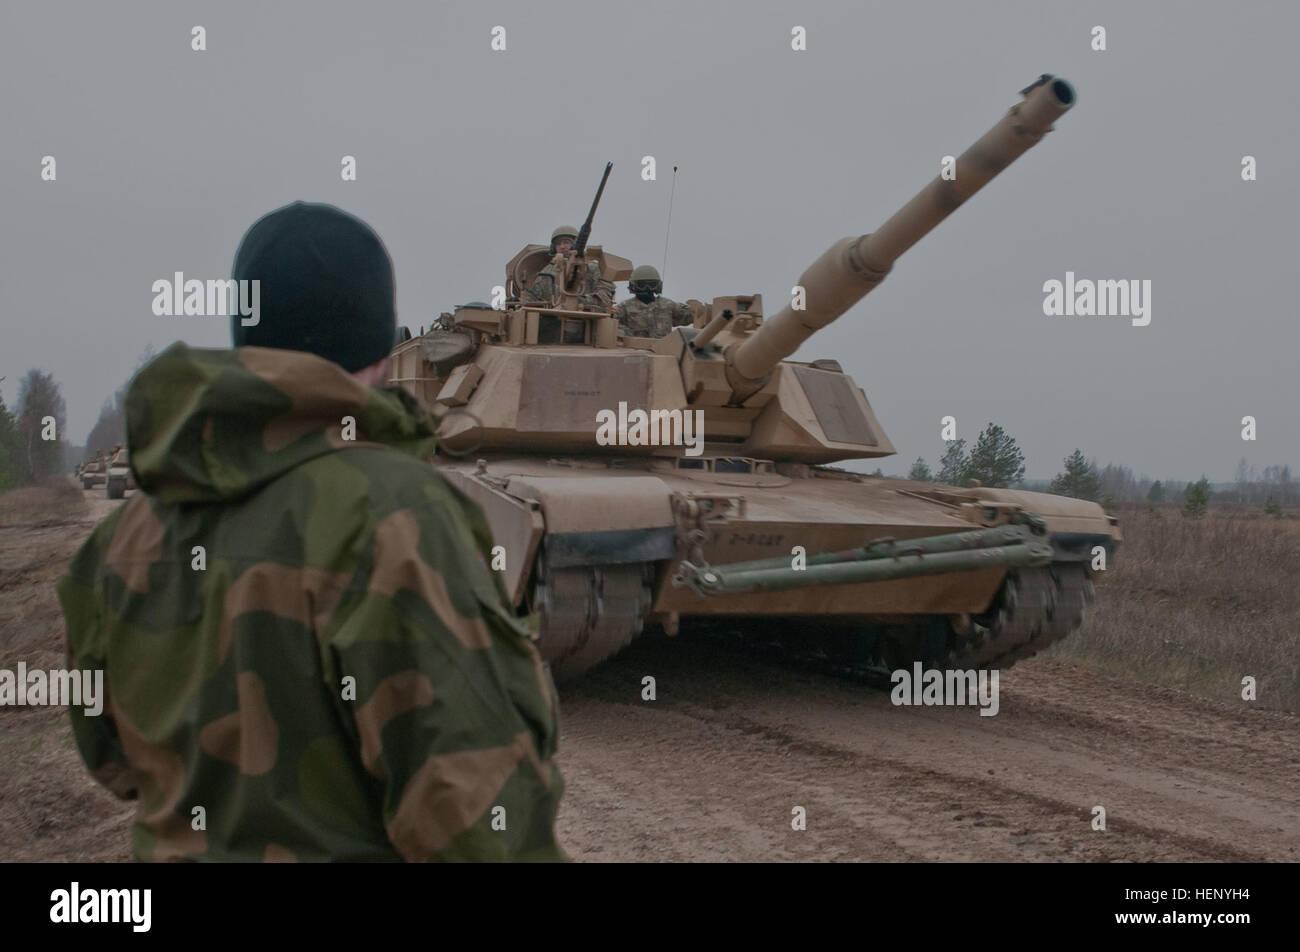 Grenadier Jonricard Schau, a Norwegian sapper, looks on as a U.S. Army M1A2 Abrams Tank moves past the defensive Stock Photo